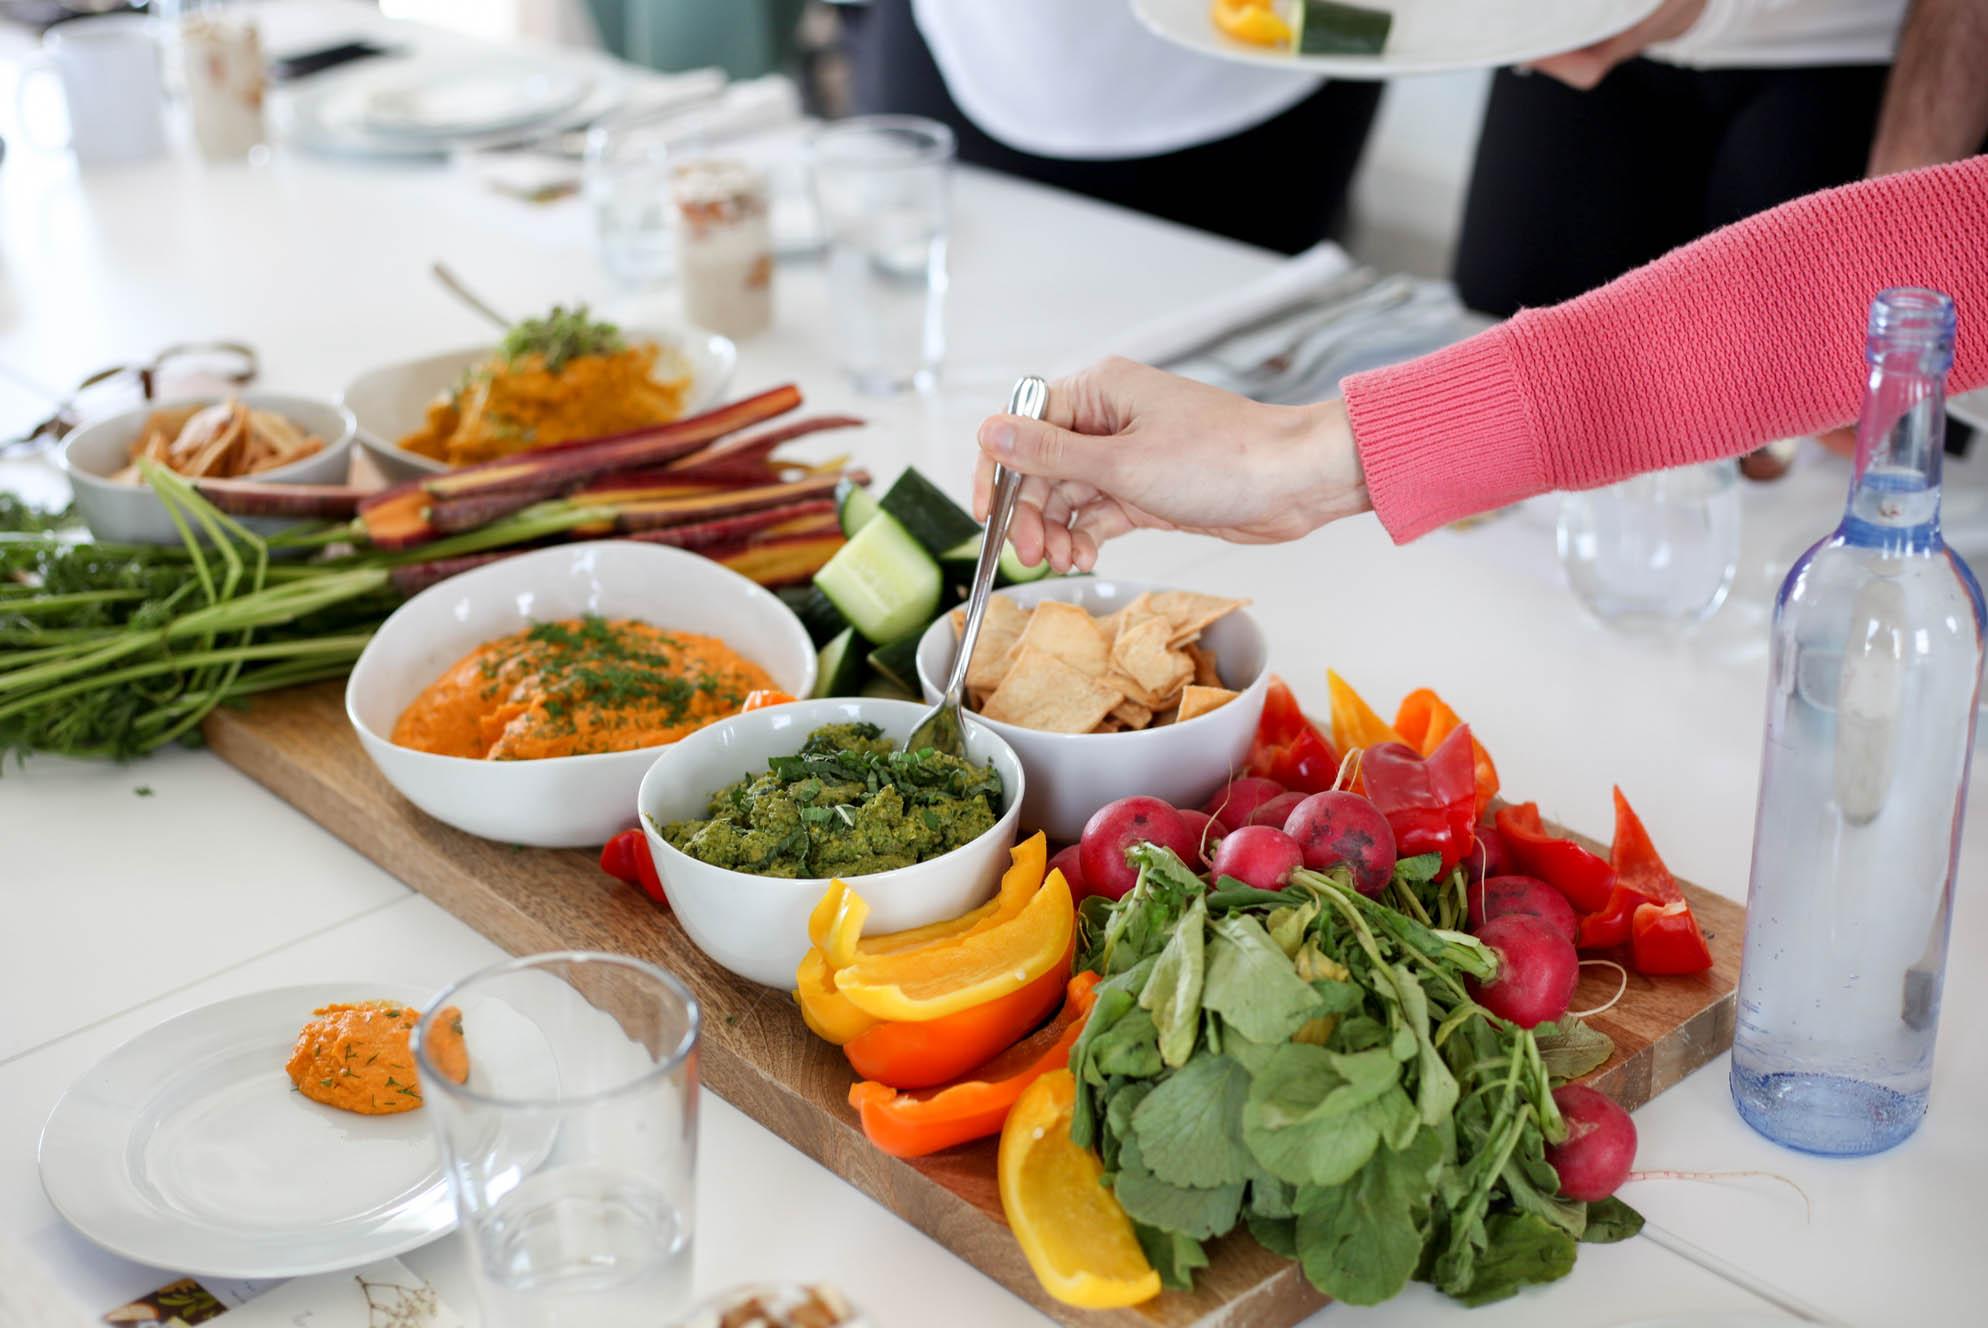 Crudite with Hummus and Broccoli pesto